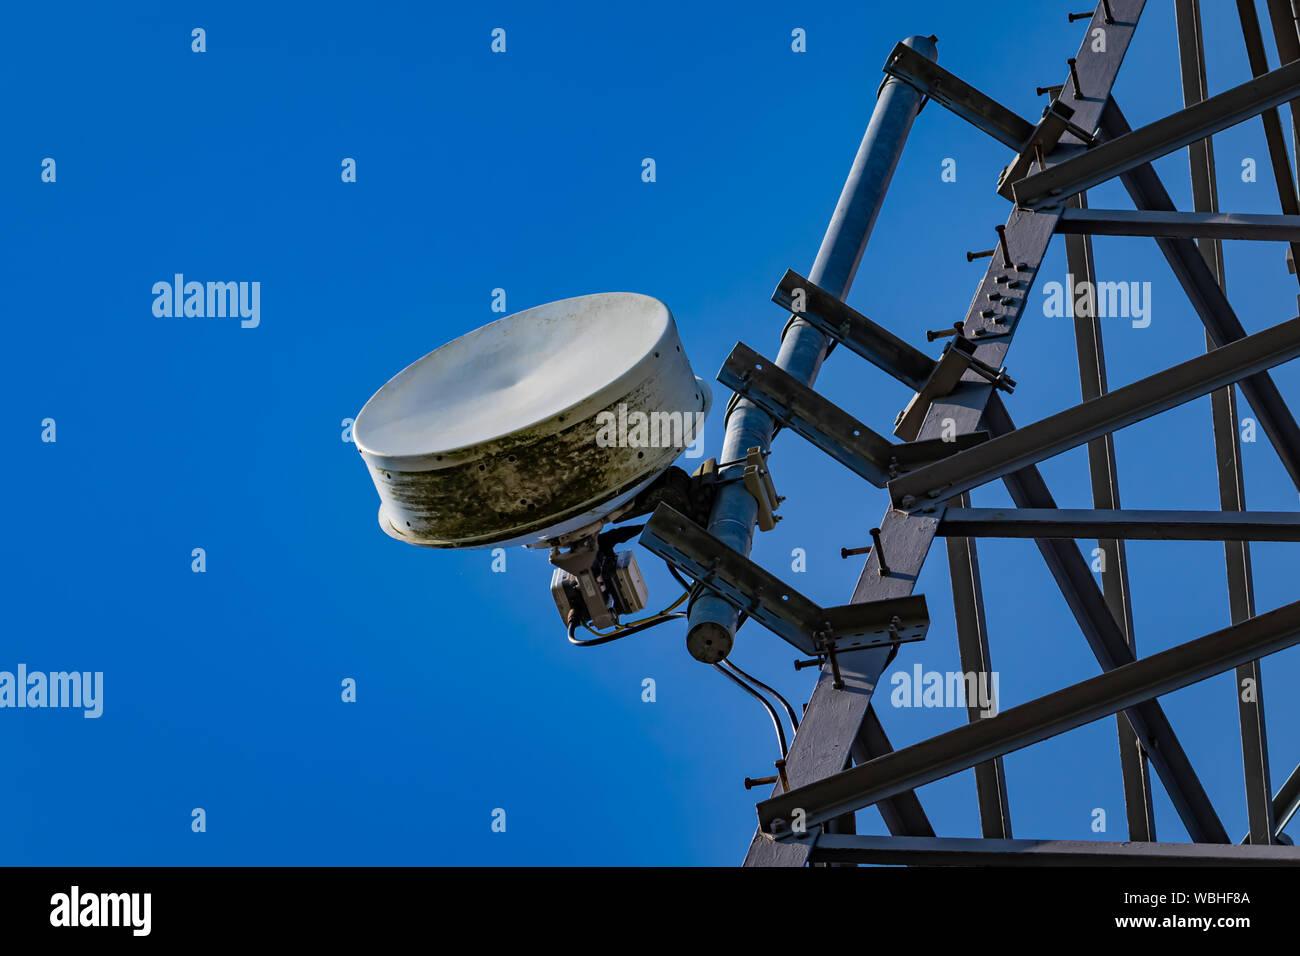 Telephone Wires Overhead Stock Photos & Telephone Wires